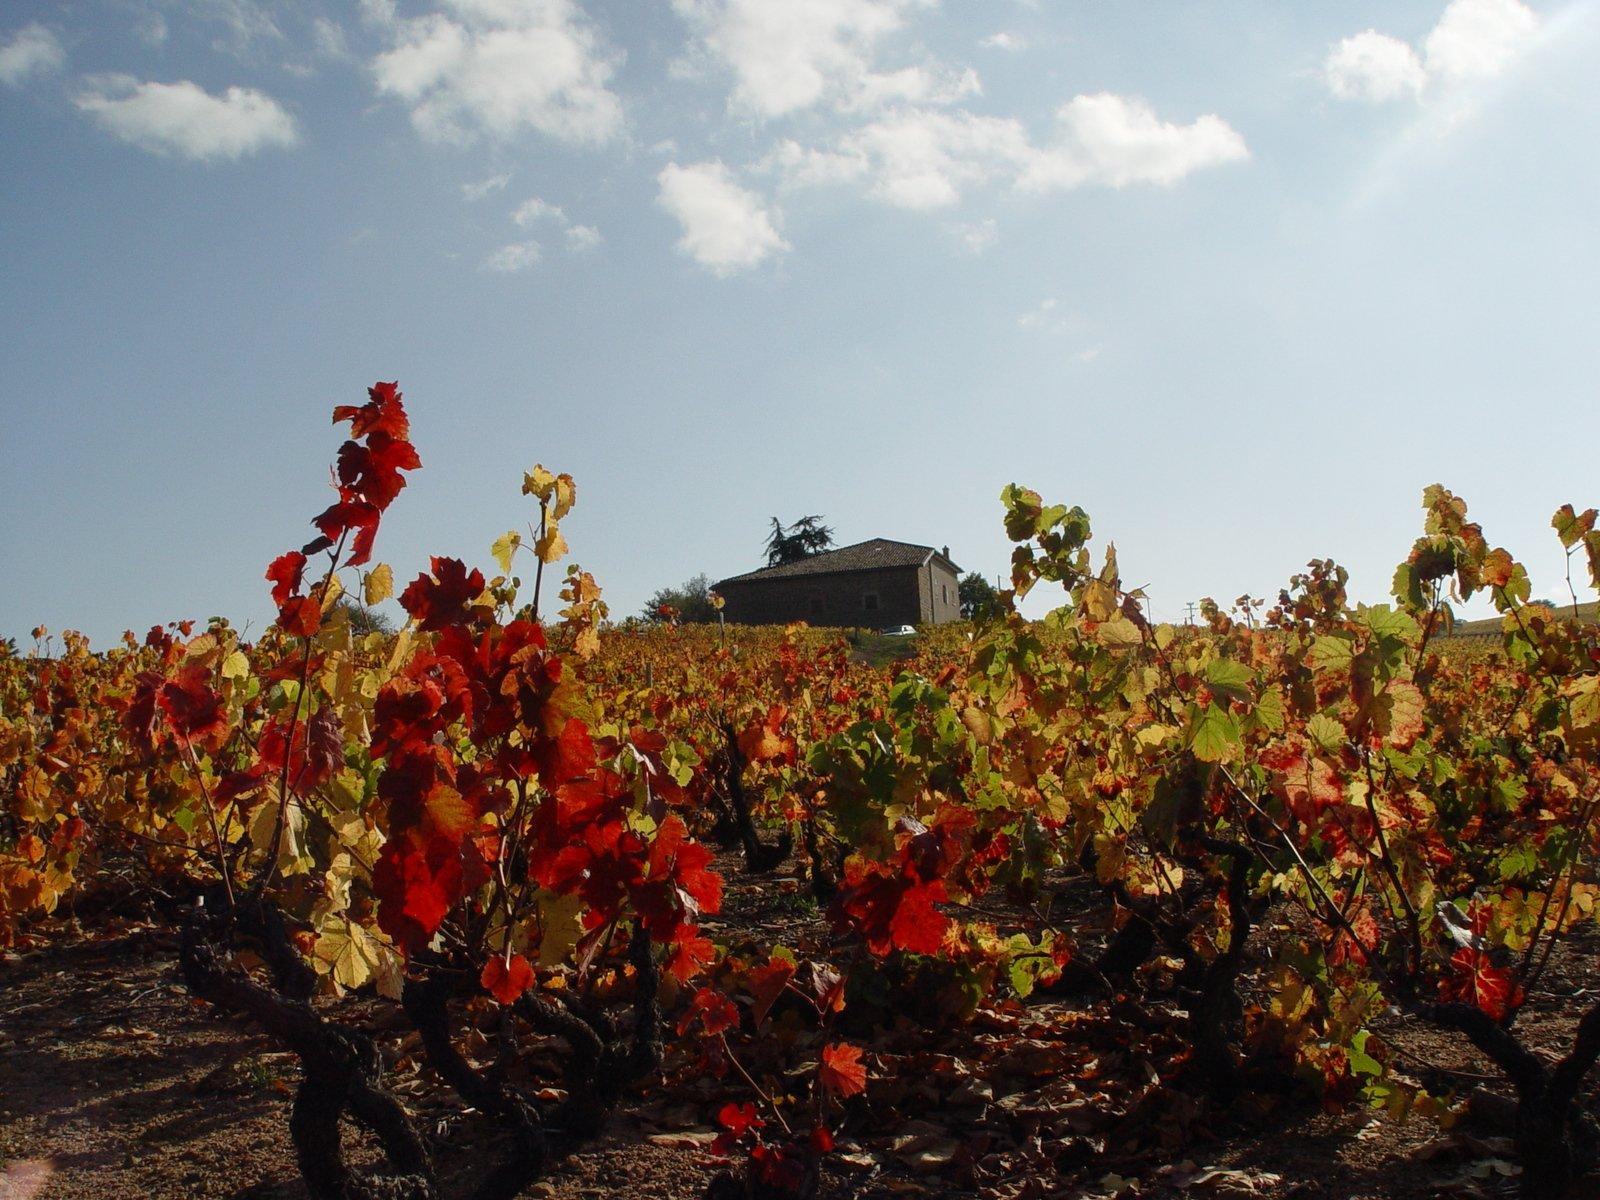 3rd Thursday of November is Beaujolais time!